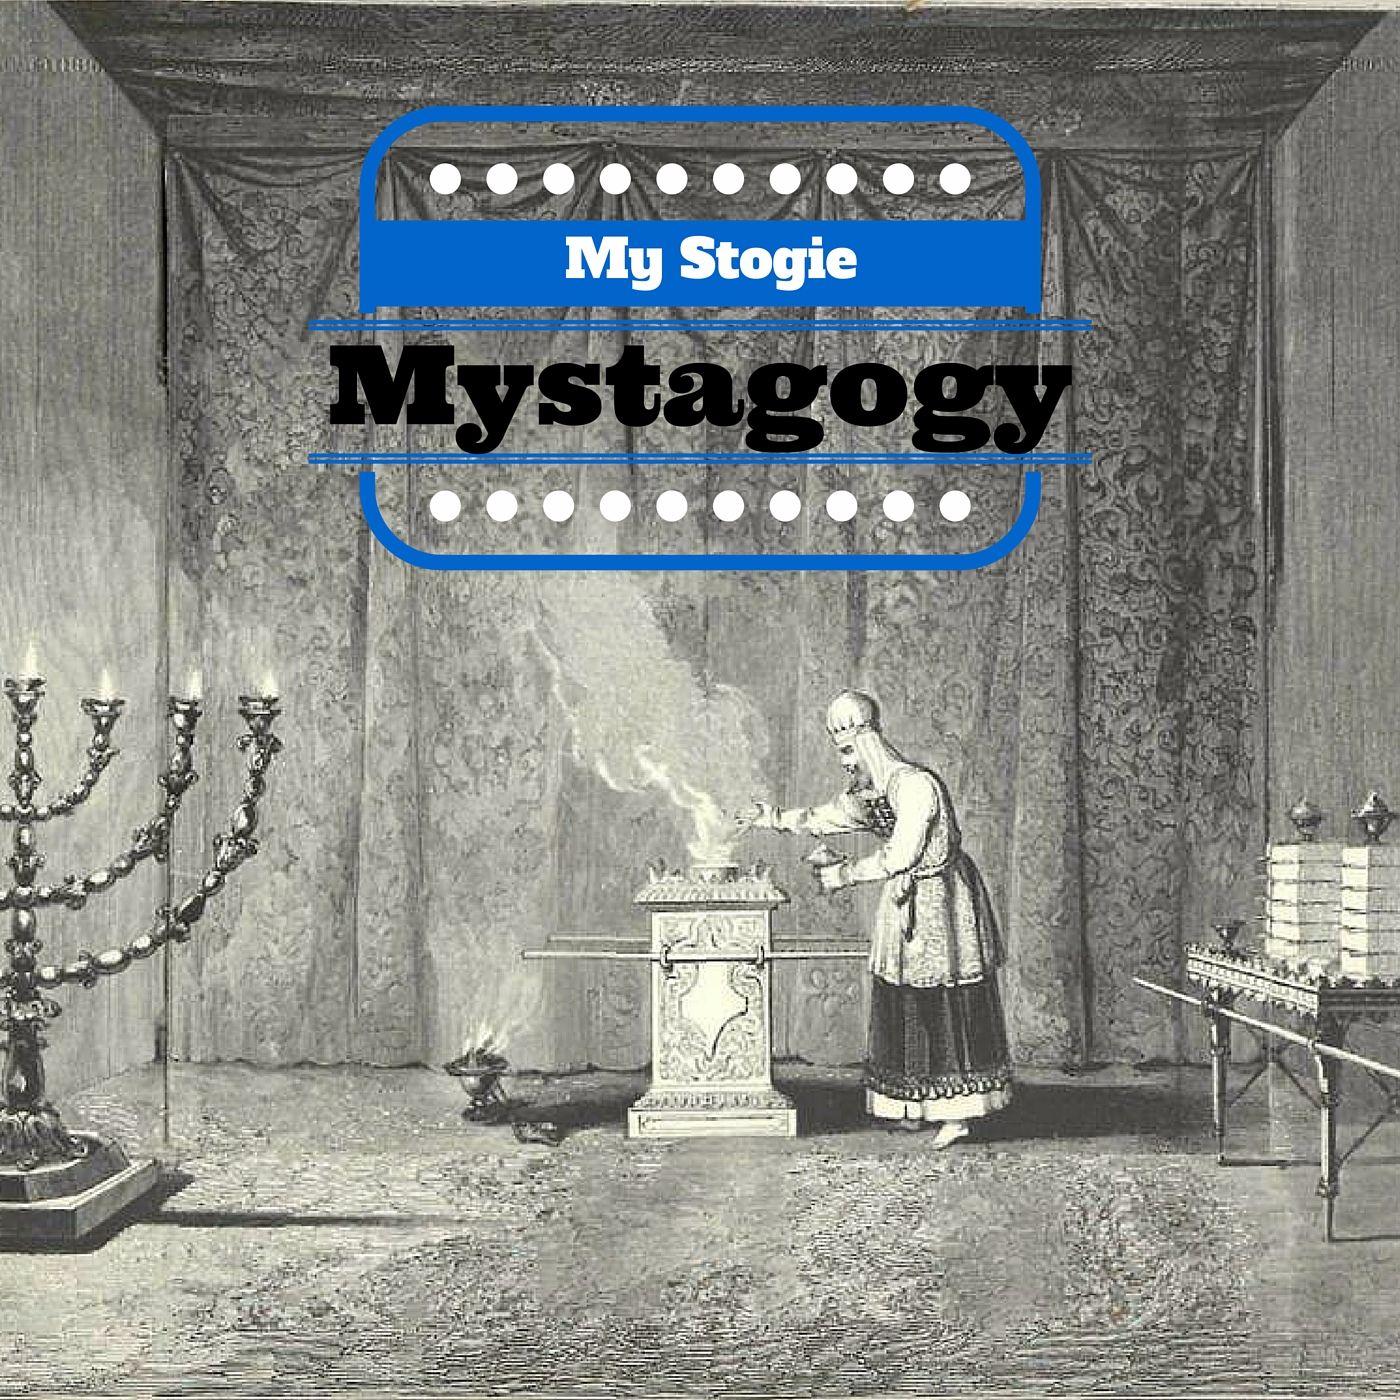 My Stogie Mystagogy